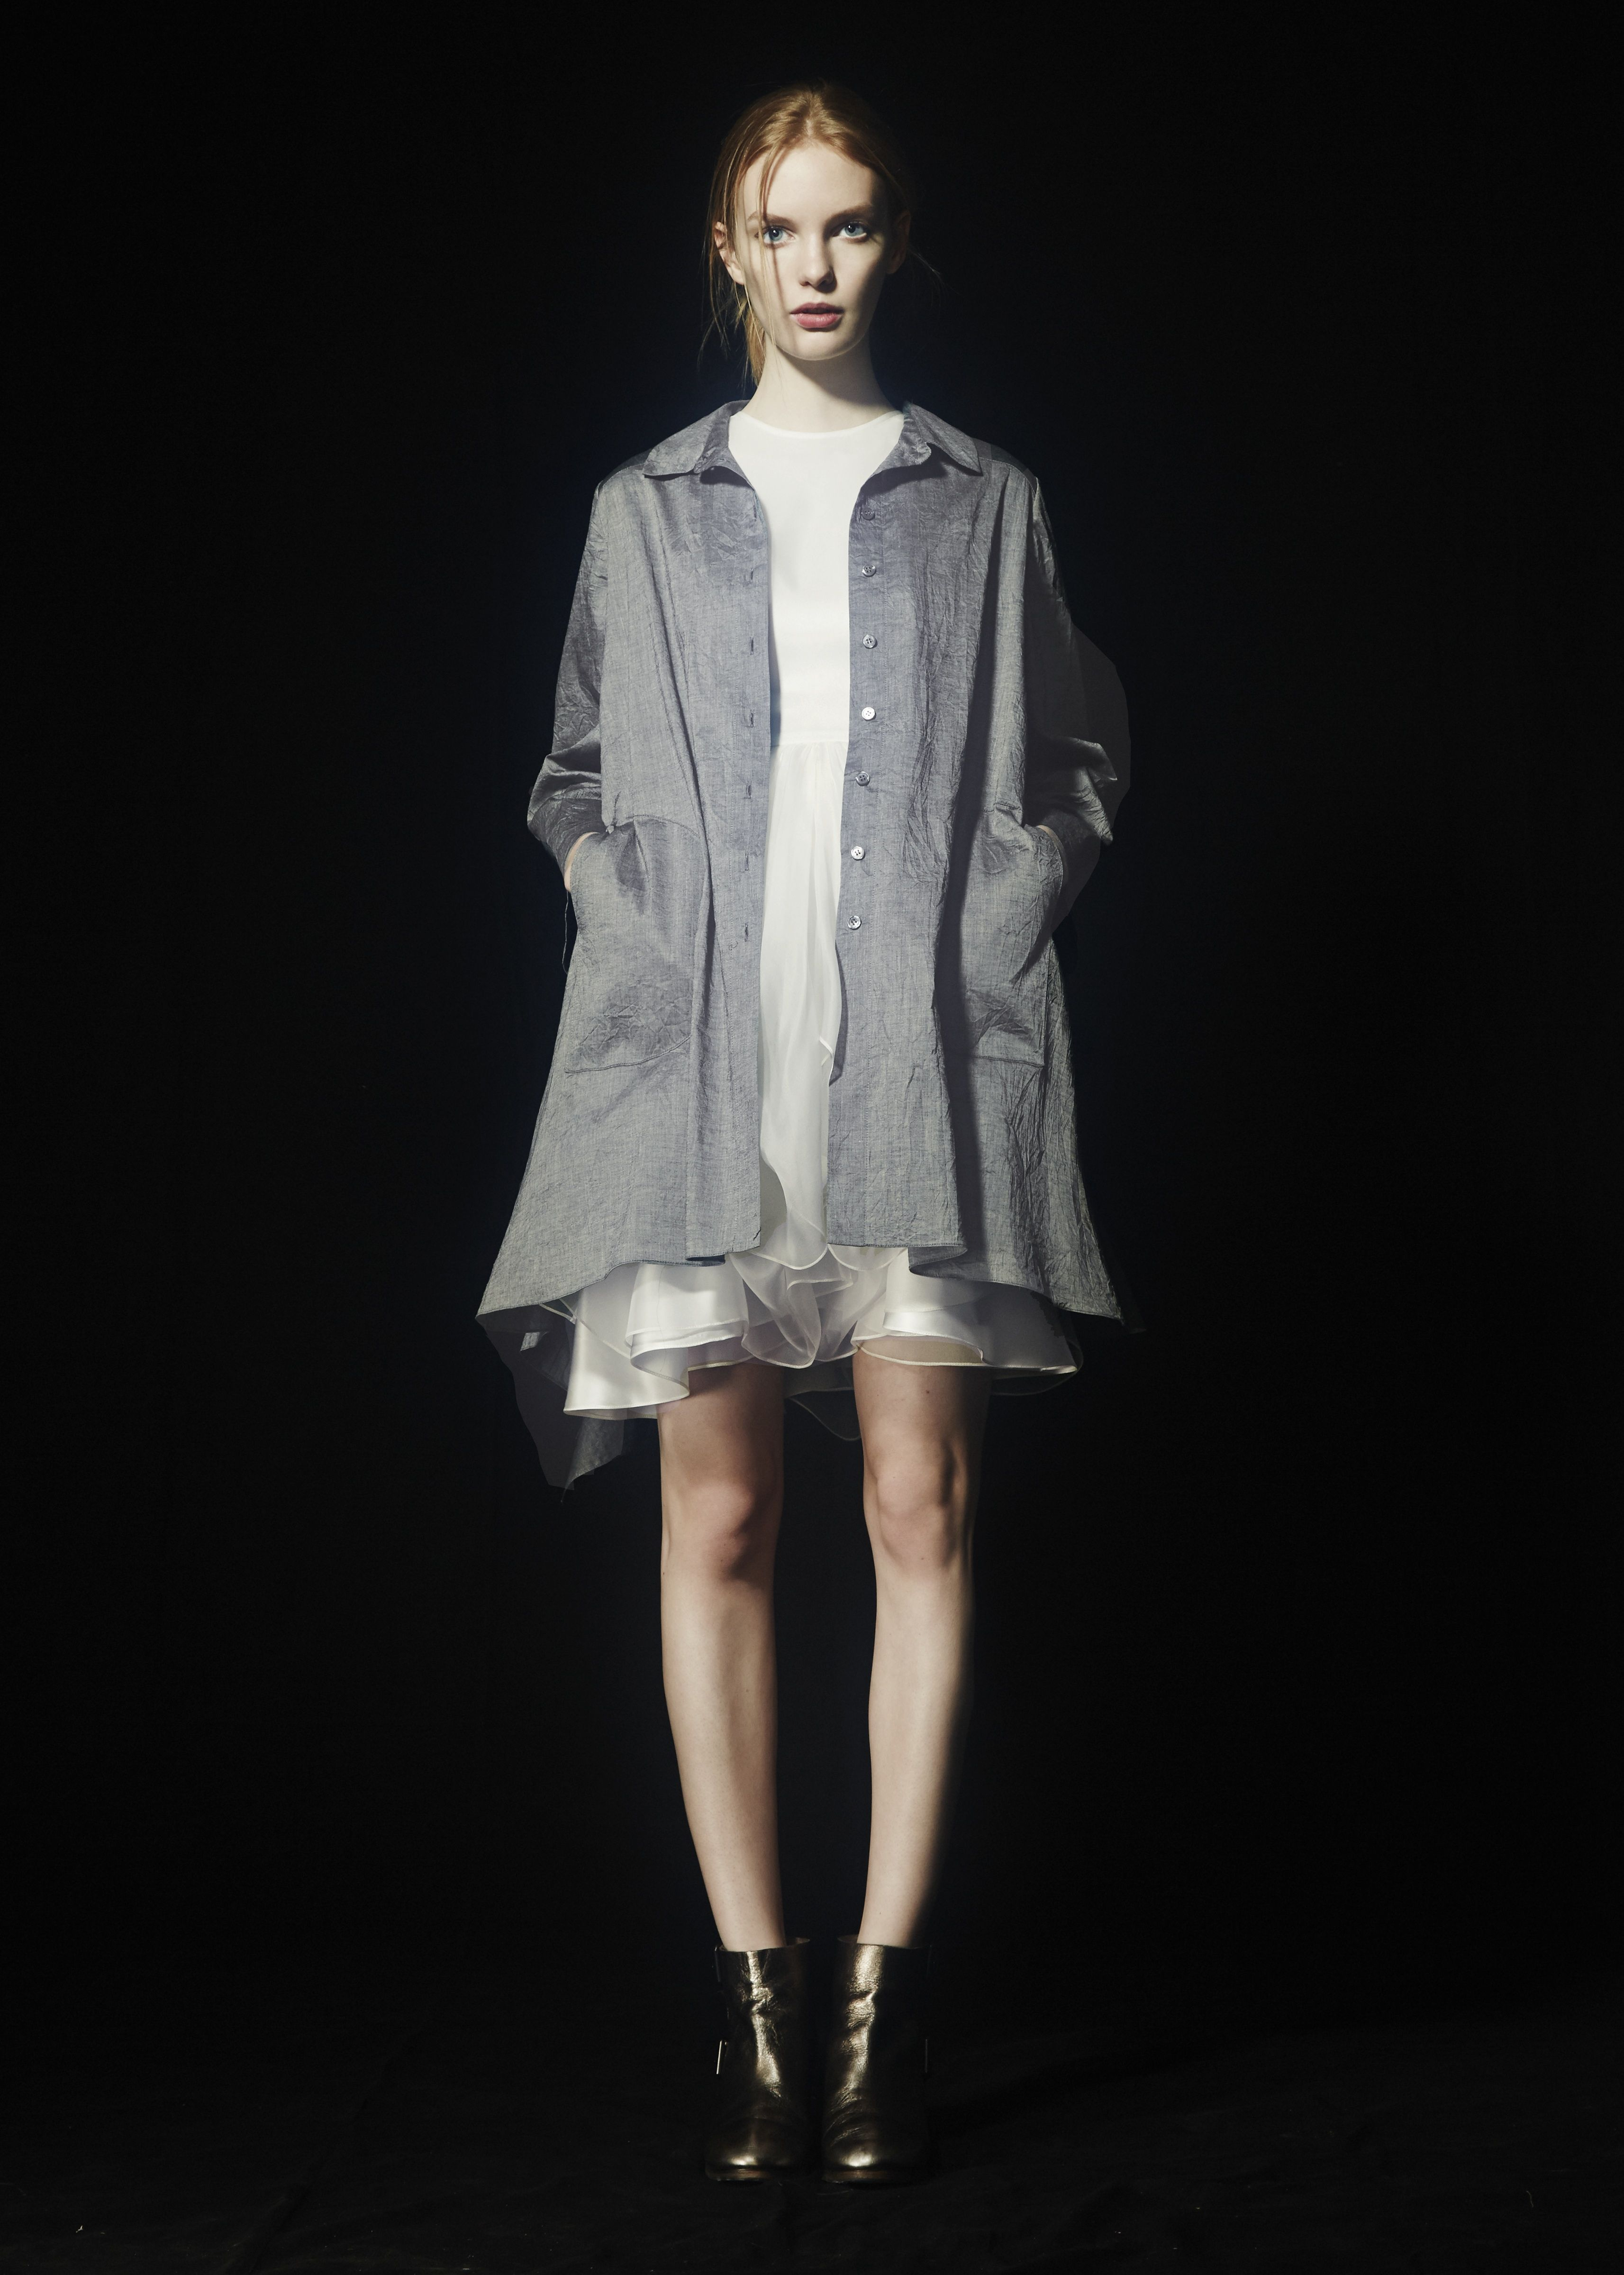 Eudora shirt Muse gown